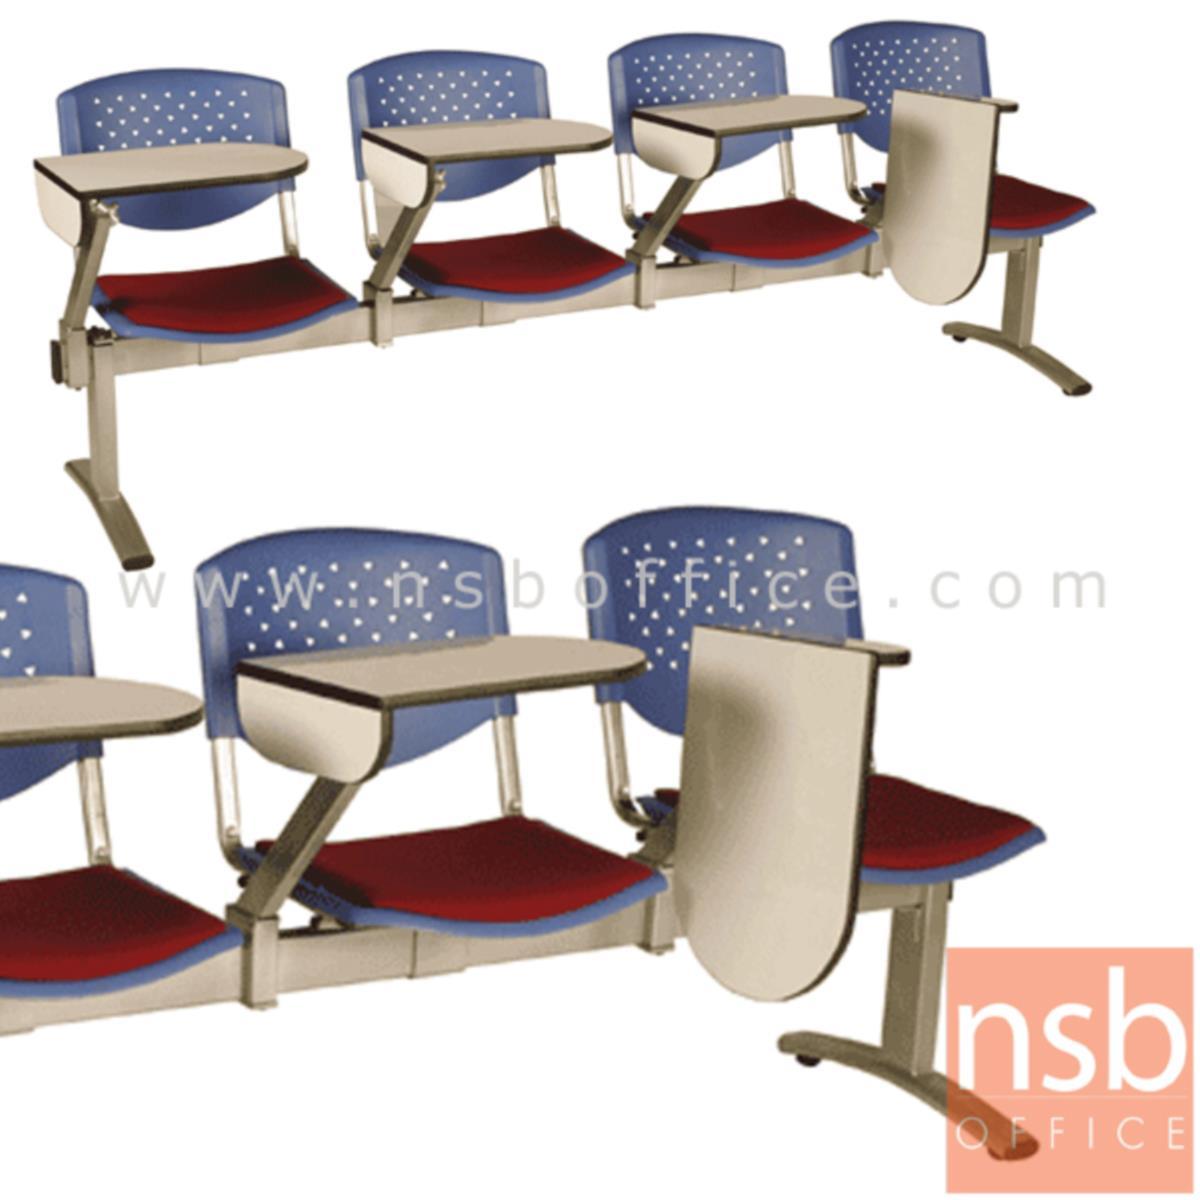 B17A018:เก้าอี้เลคเชอร์แถวเฟรมโพลี่หุ้มเบาะ รุ่น D936 2 ,3 และ 4 ที่นั่ง ขาเหล็กพ่นสีเทา